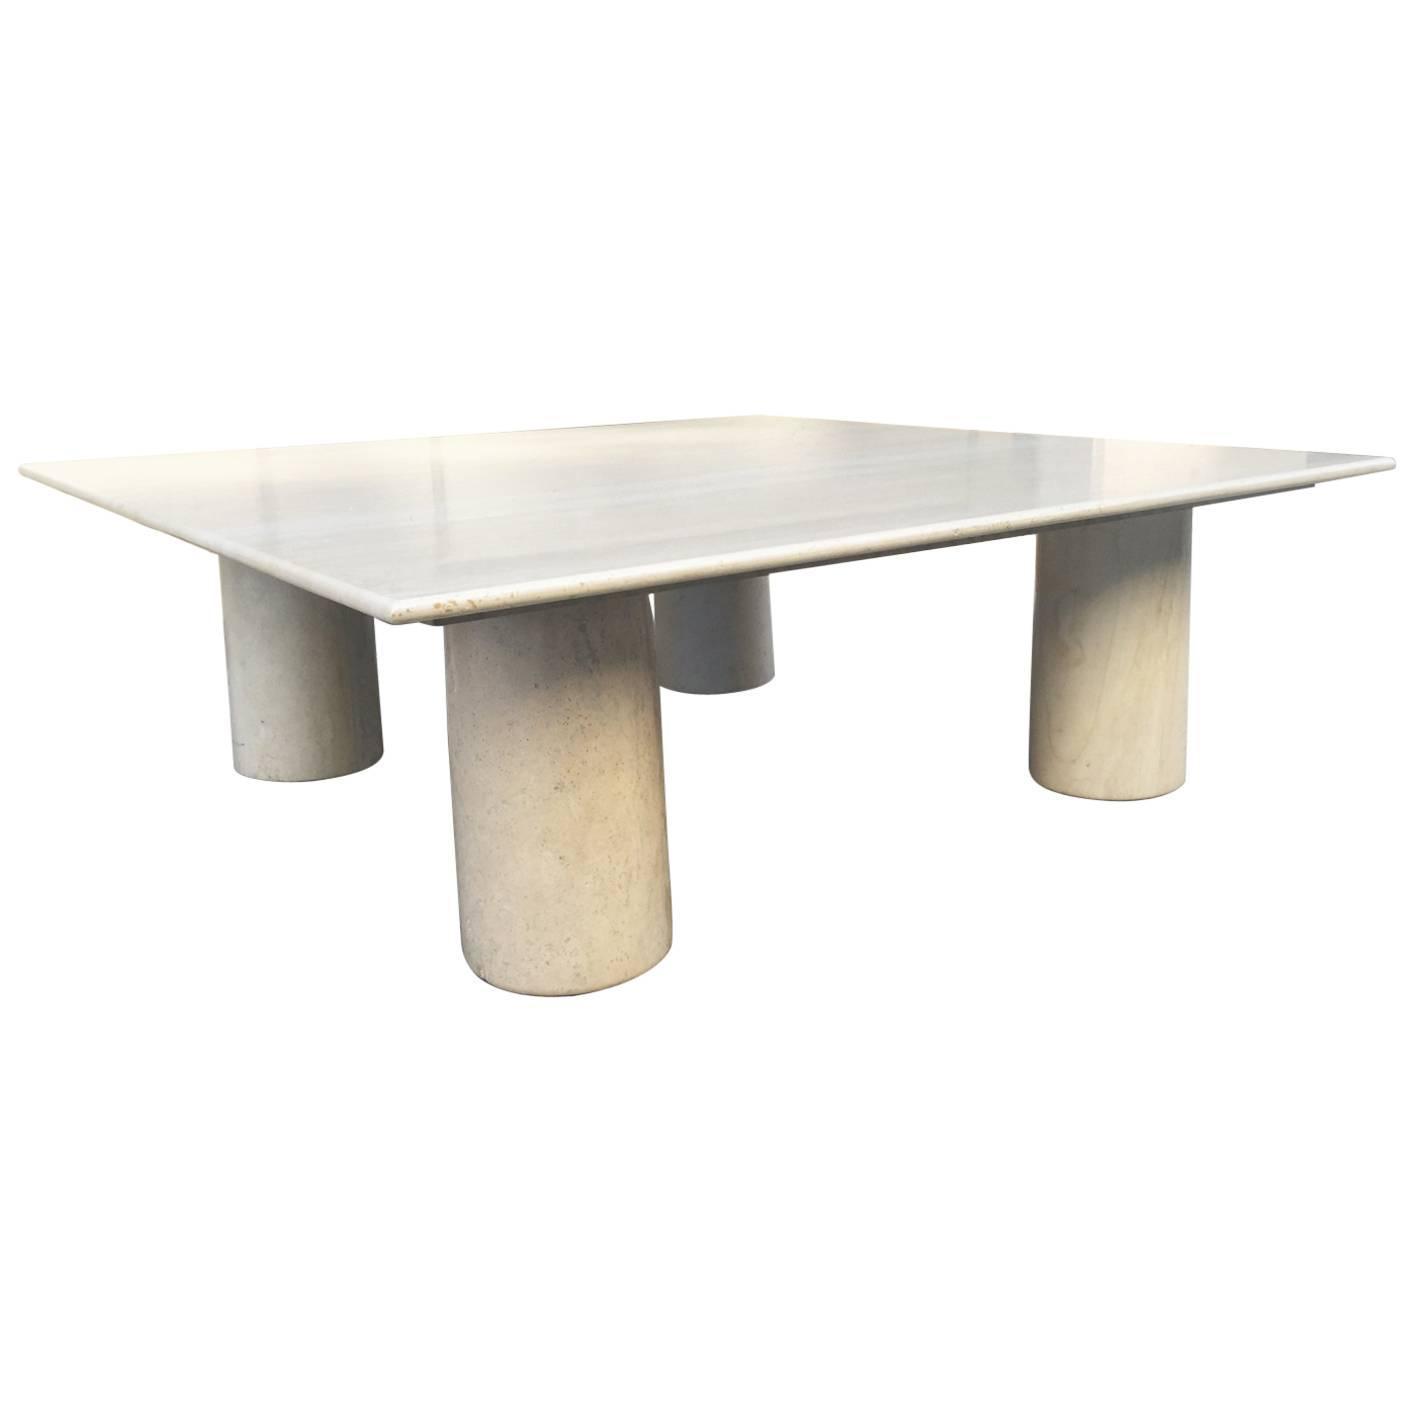 Mario Bellini Italian Marble Coffee Table For Sale at 1stdibs